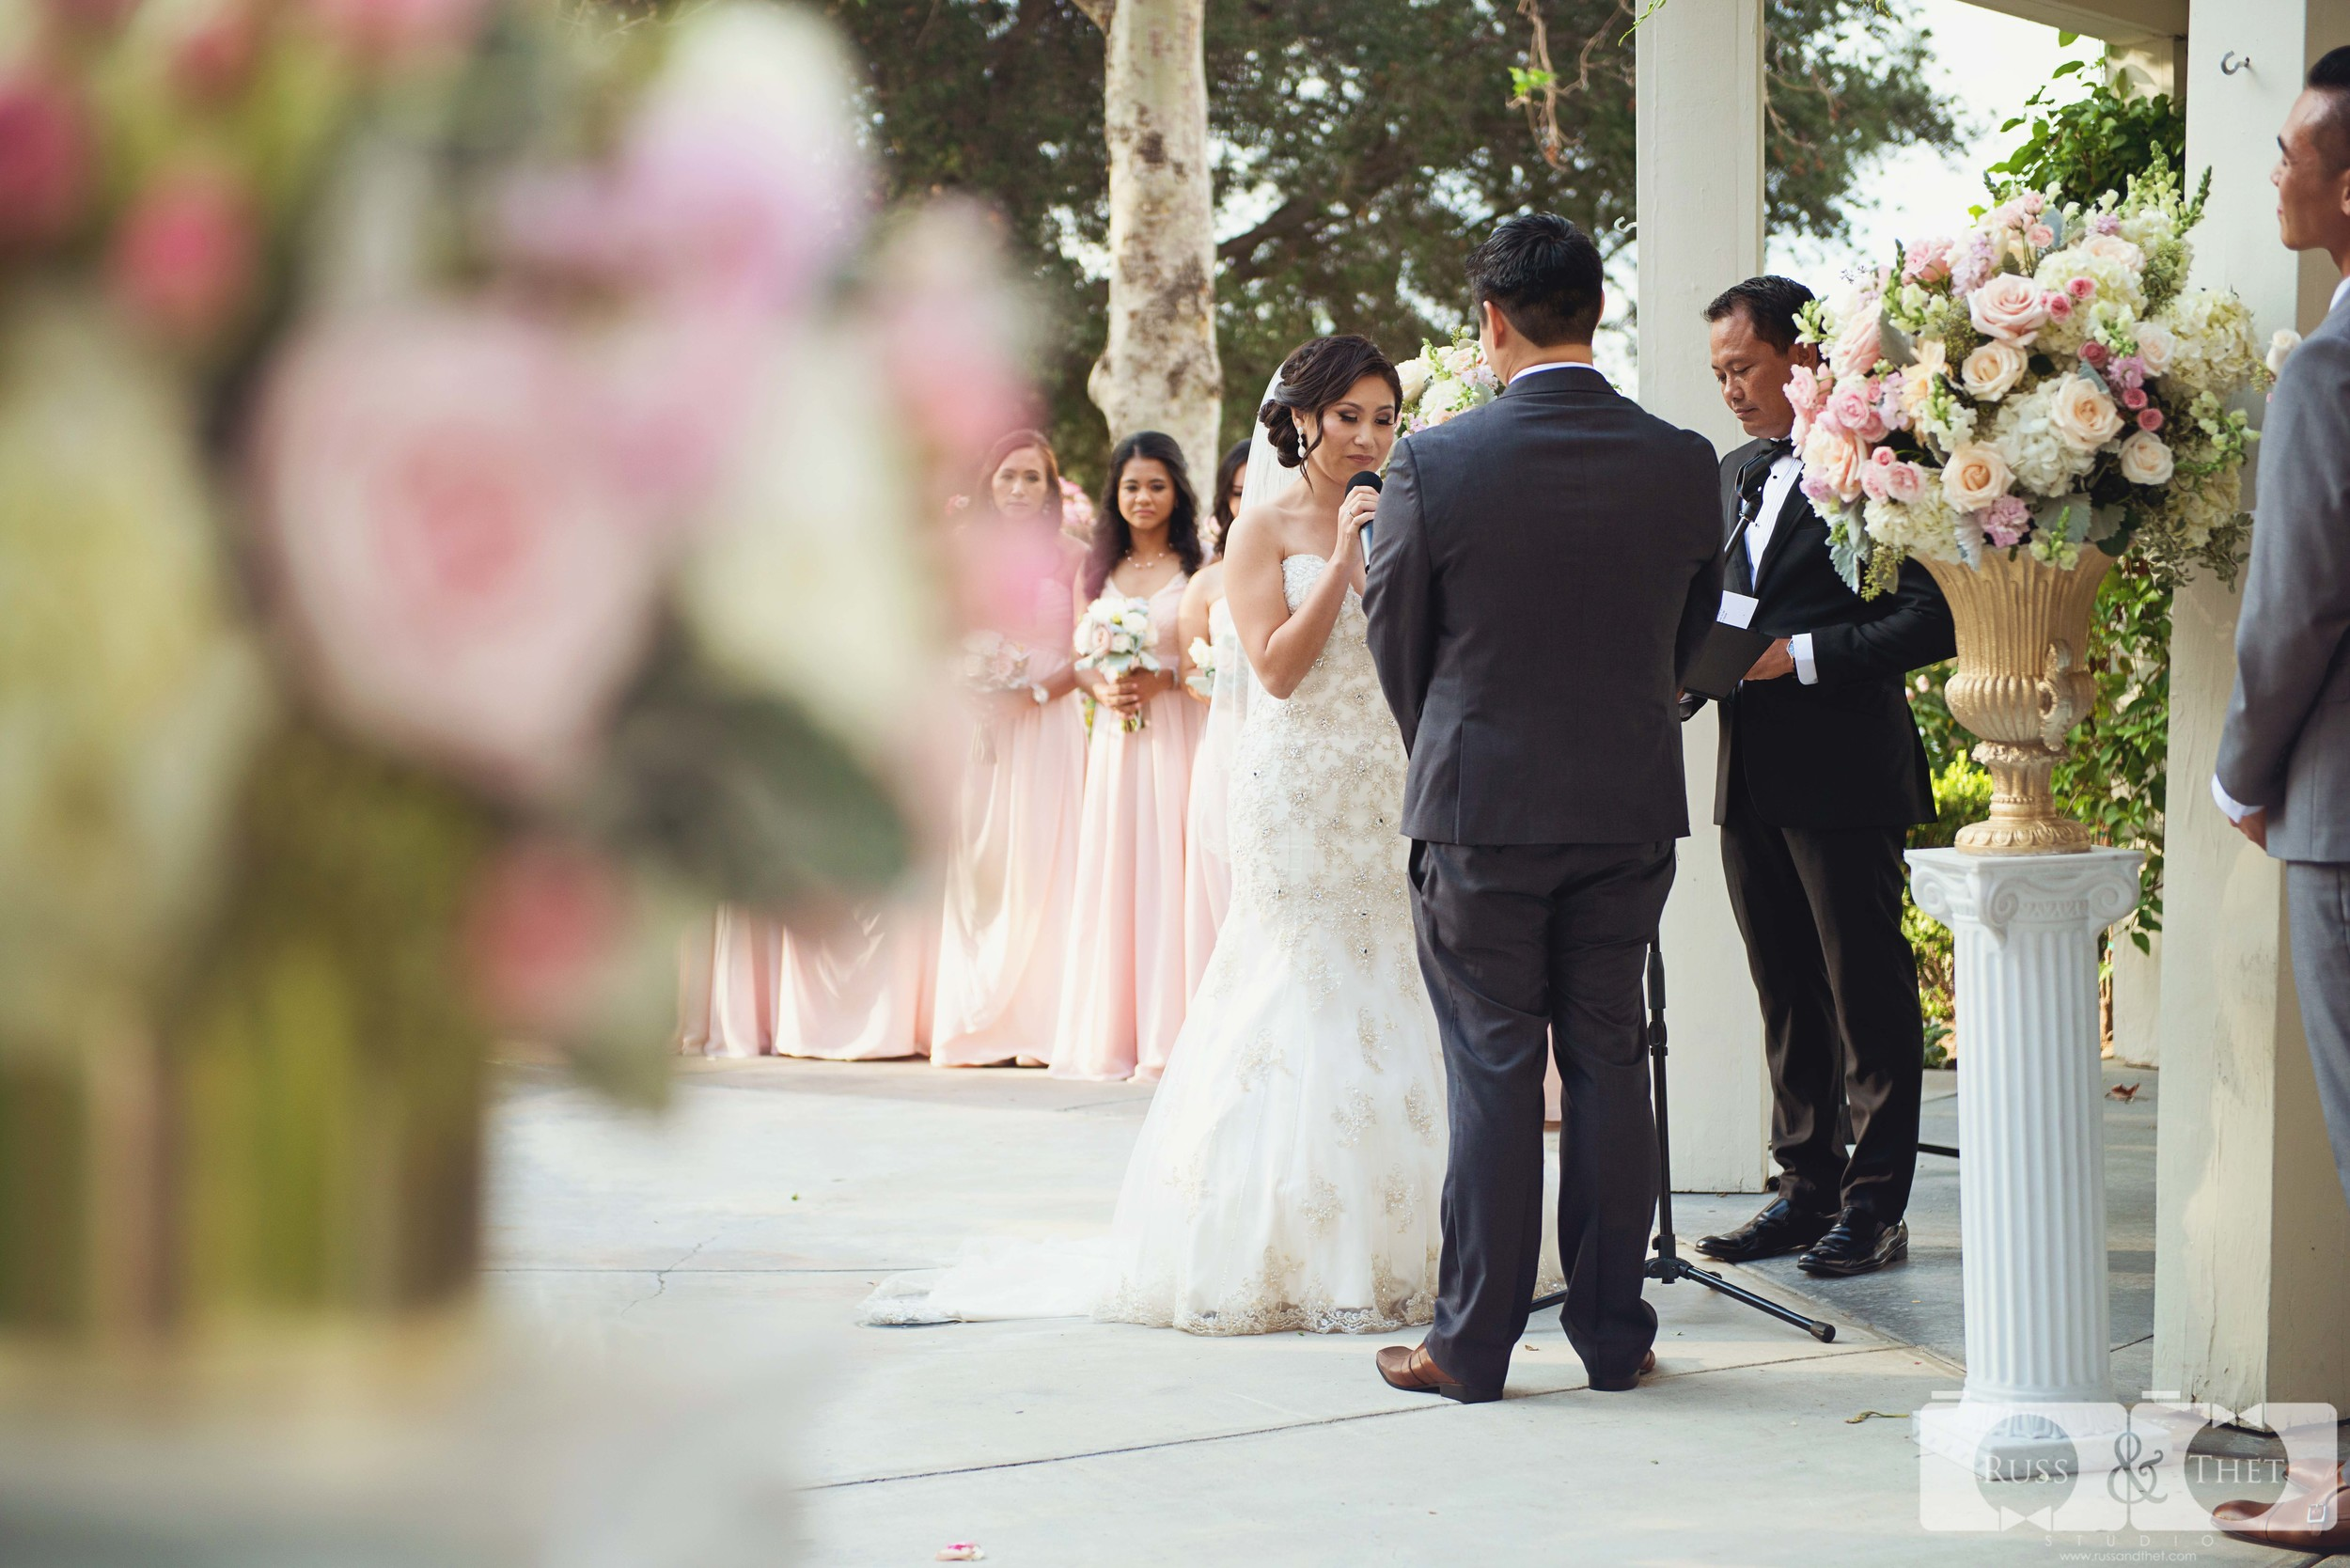 summit-house-fullerton-wedding-photographer-86.JPG